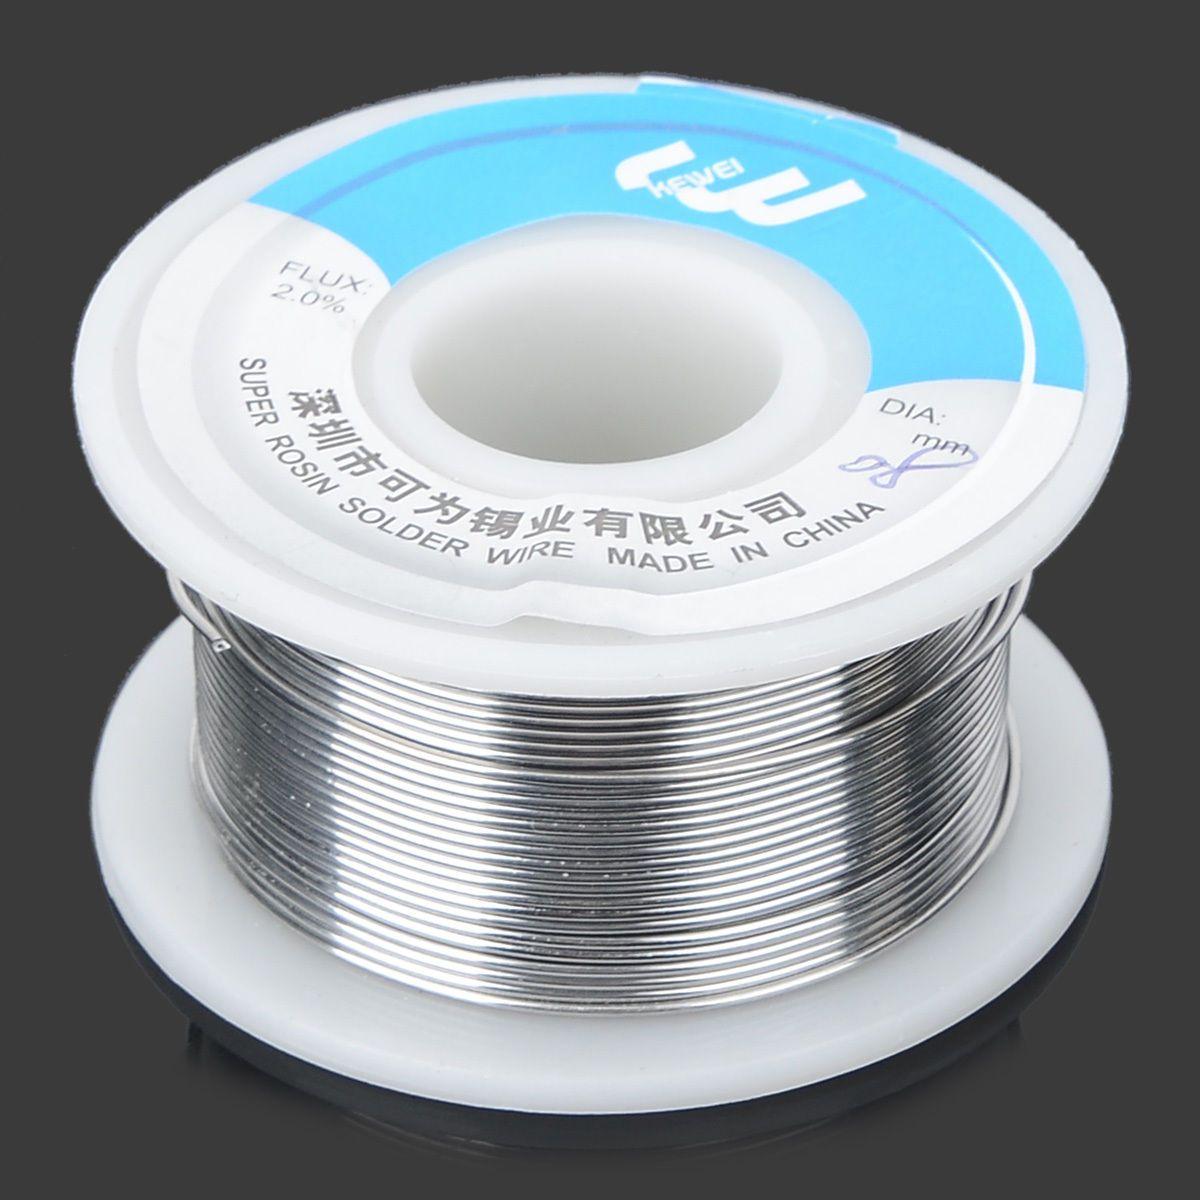 0 8mm Tin 50g Lead Rosin Core Solder Wire Soldering Welding Flux 2 ...